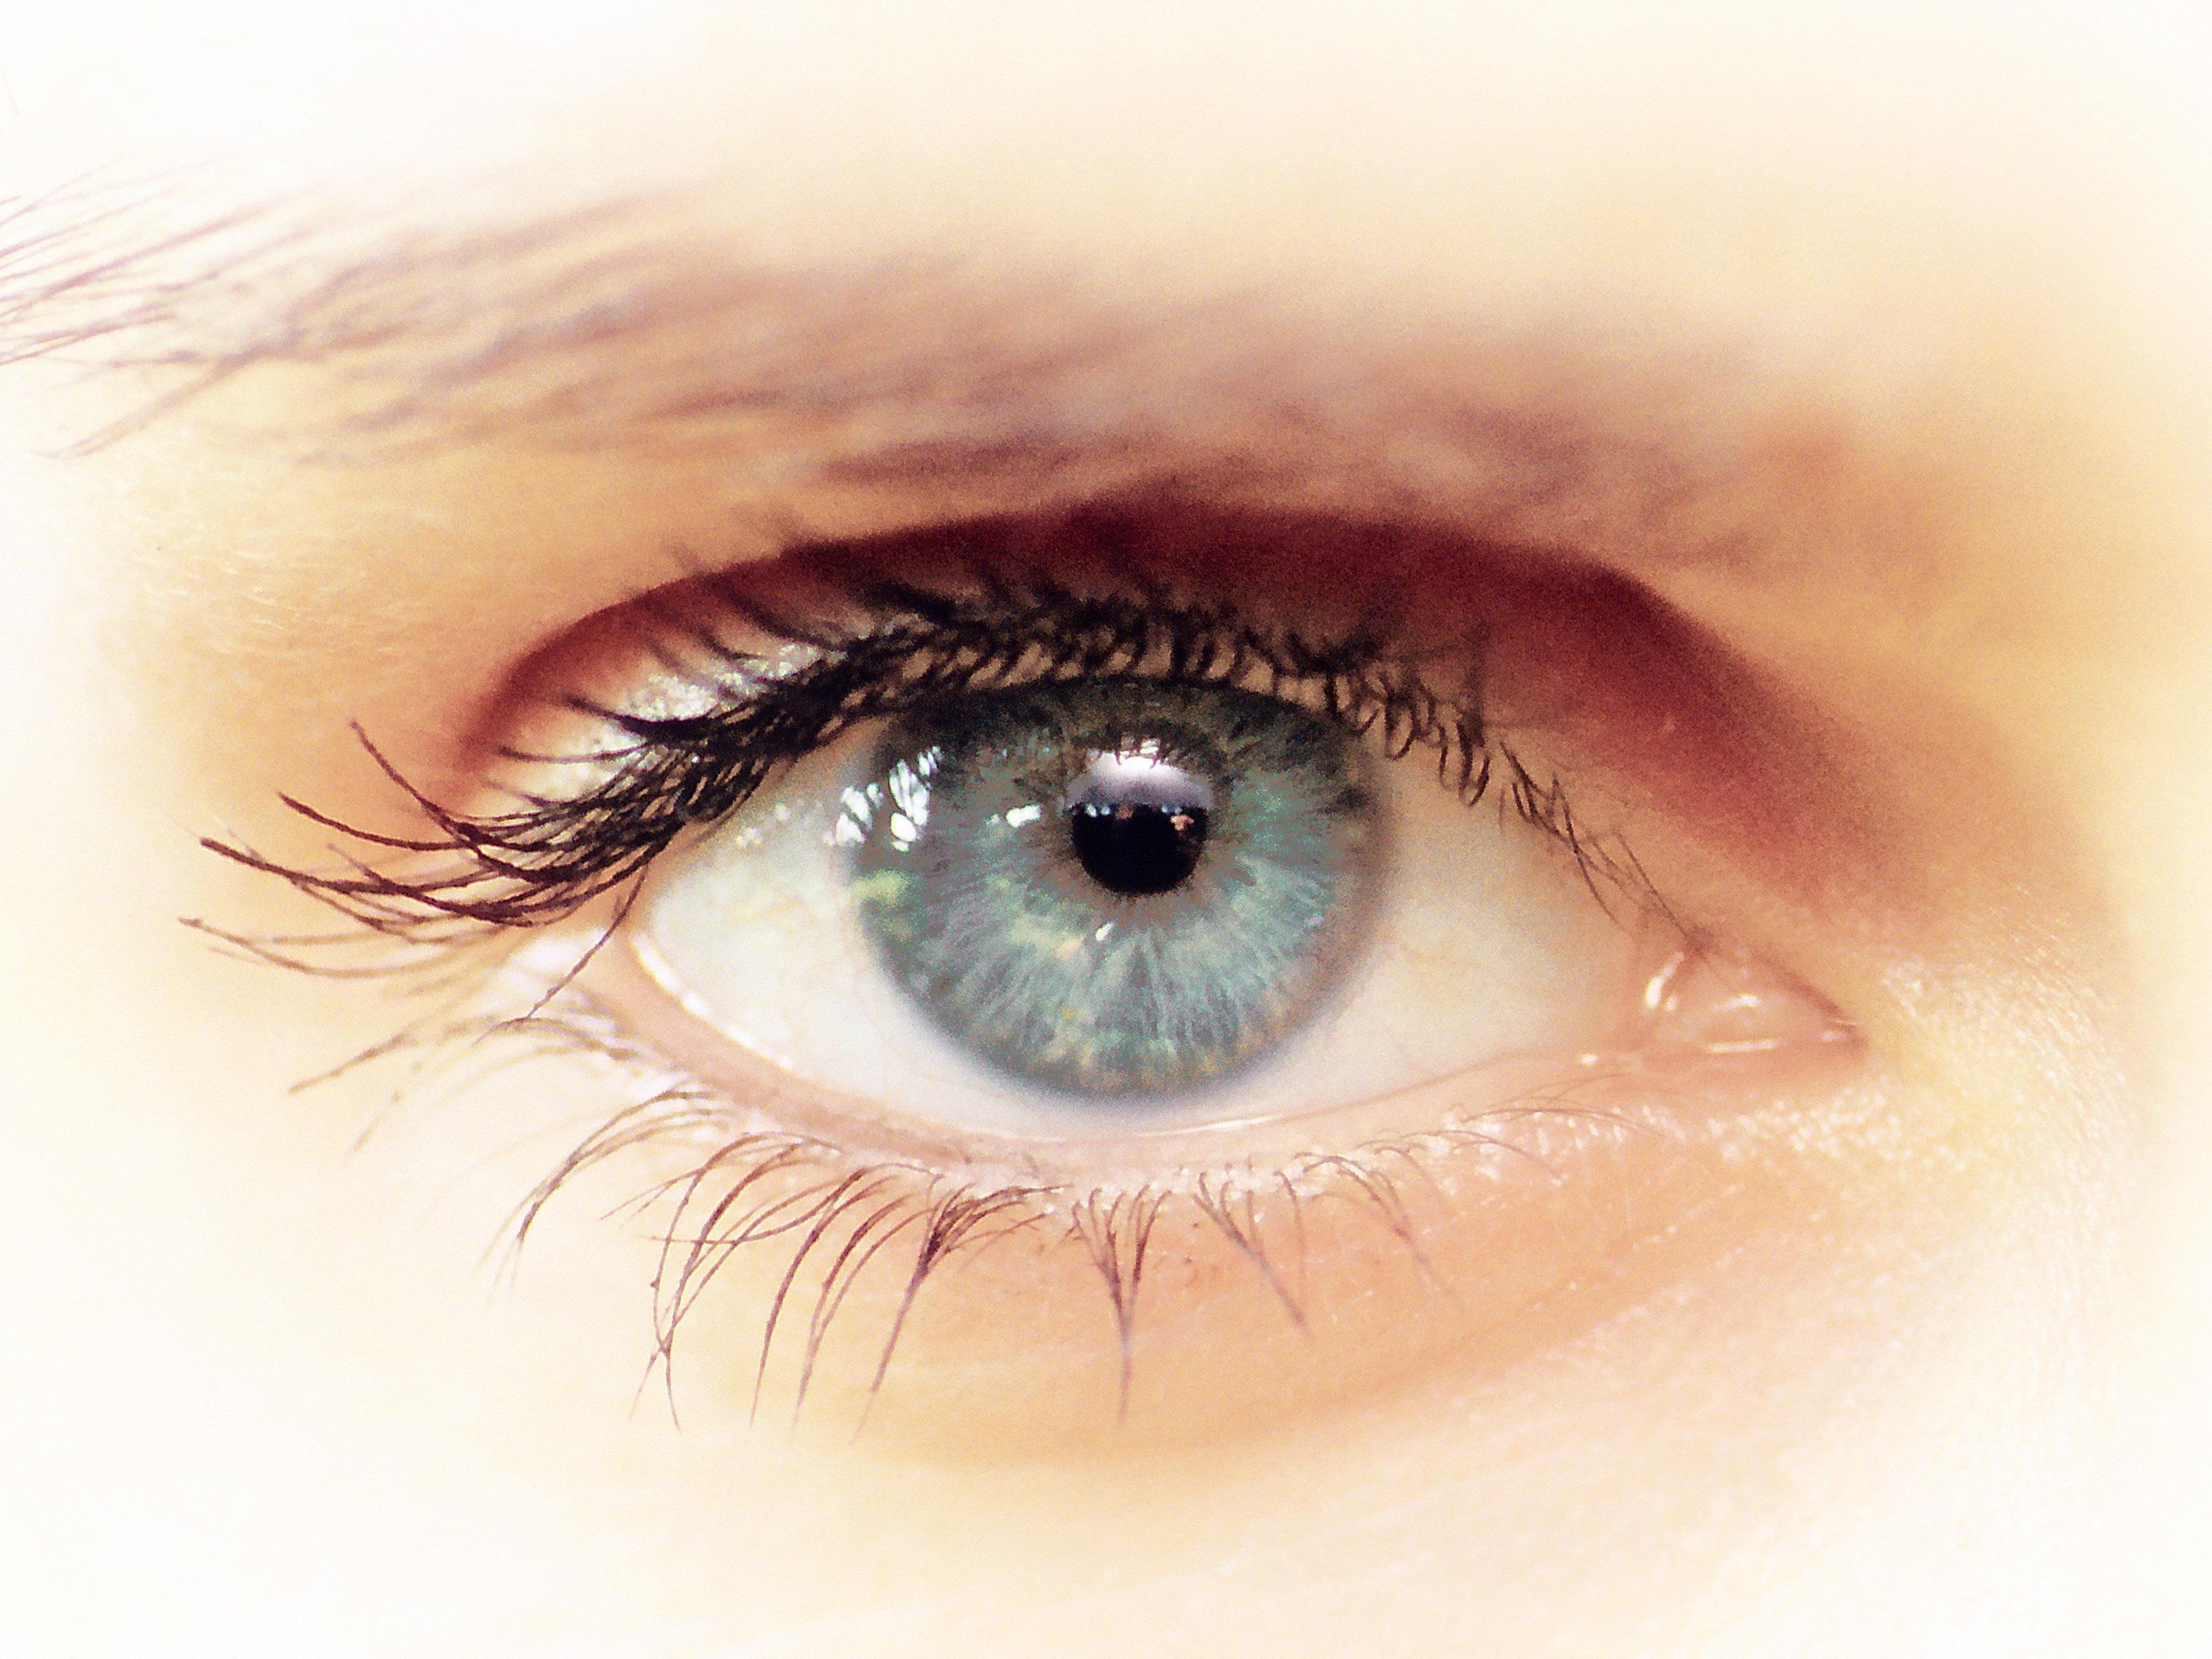 Hast Du den richtigen Blick?